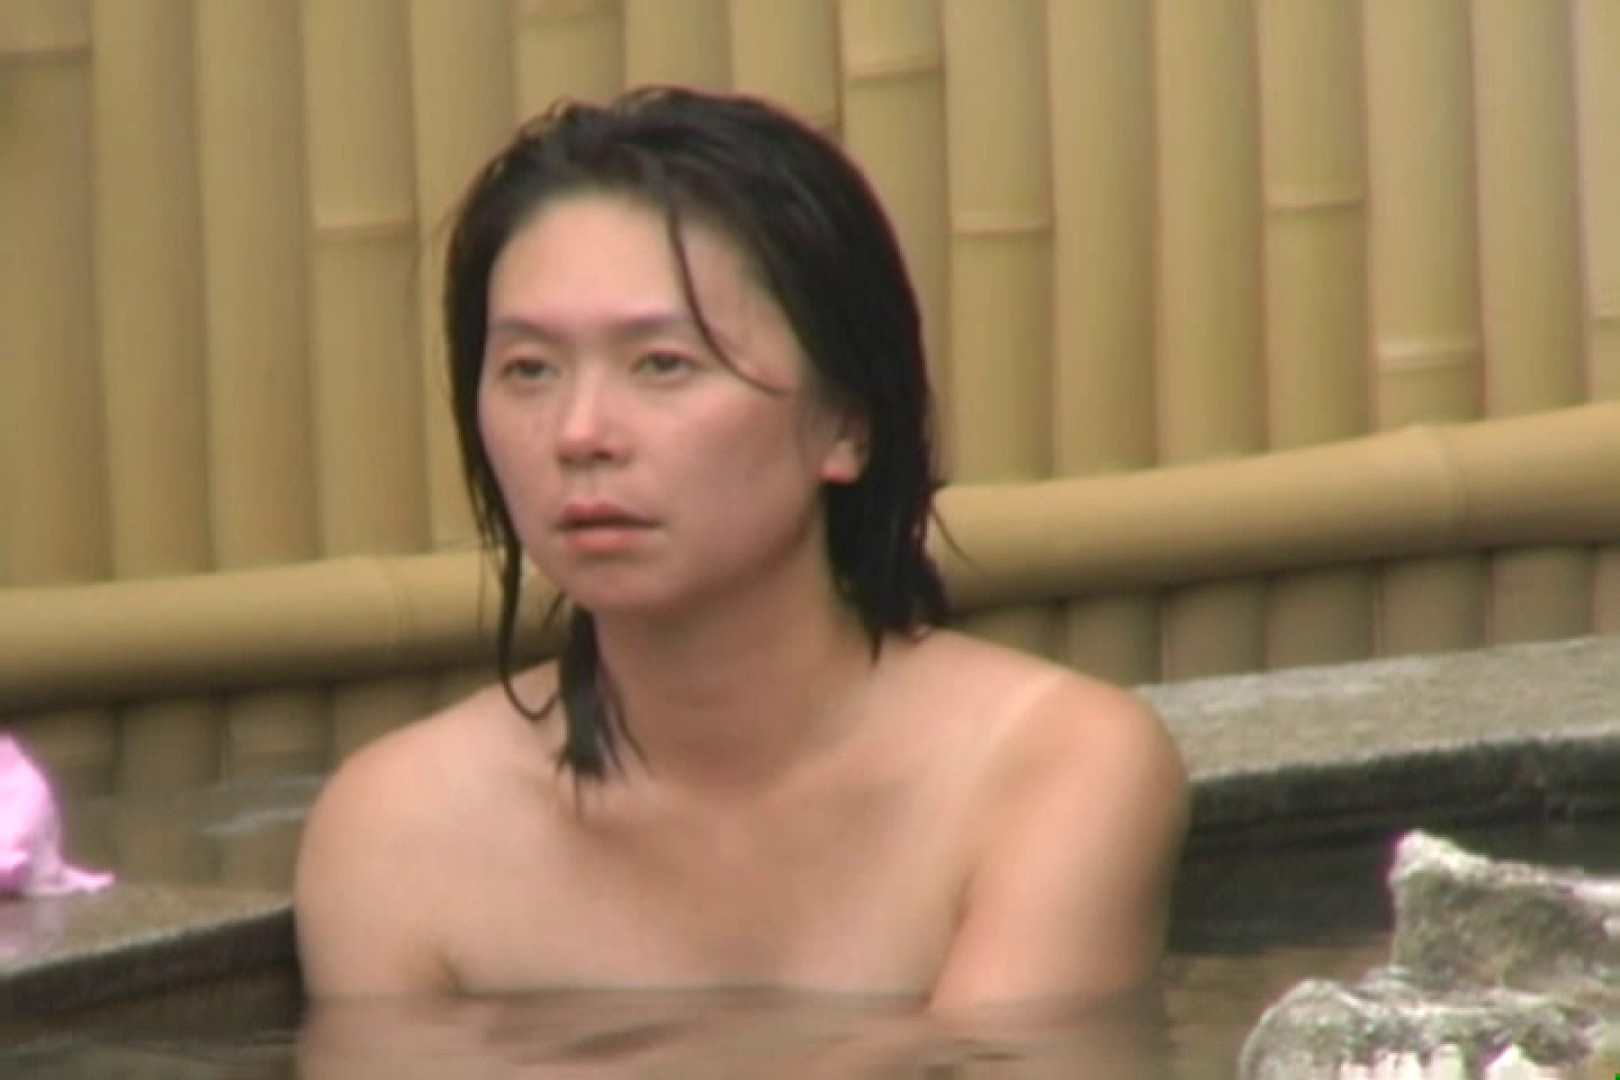 Aquaな露天風呂Vol.619 HなOL オマンコ動画キャプチャ 107pic 72